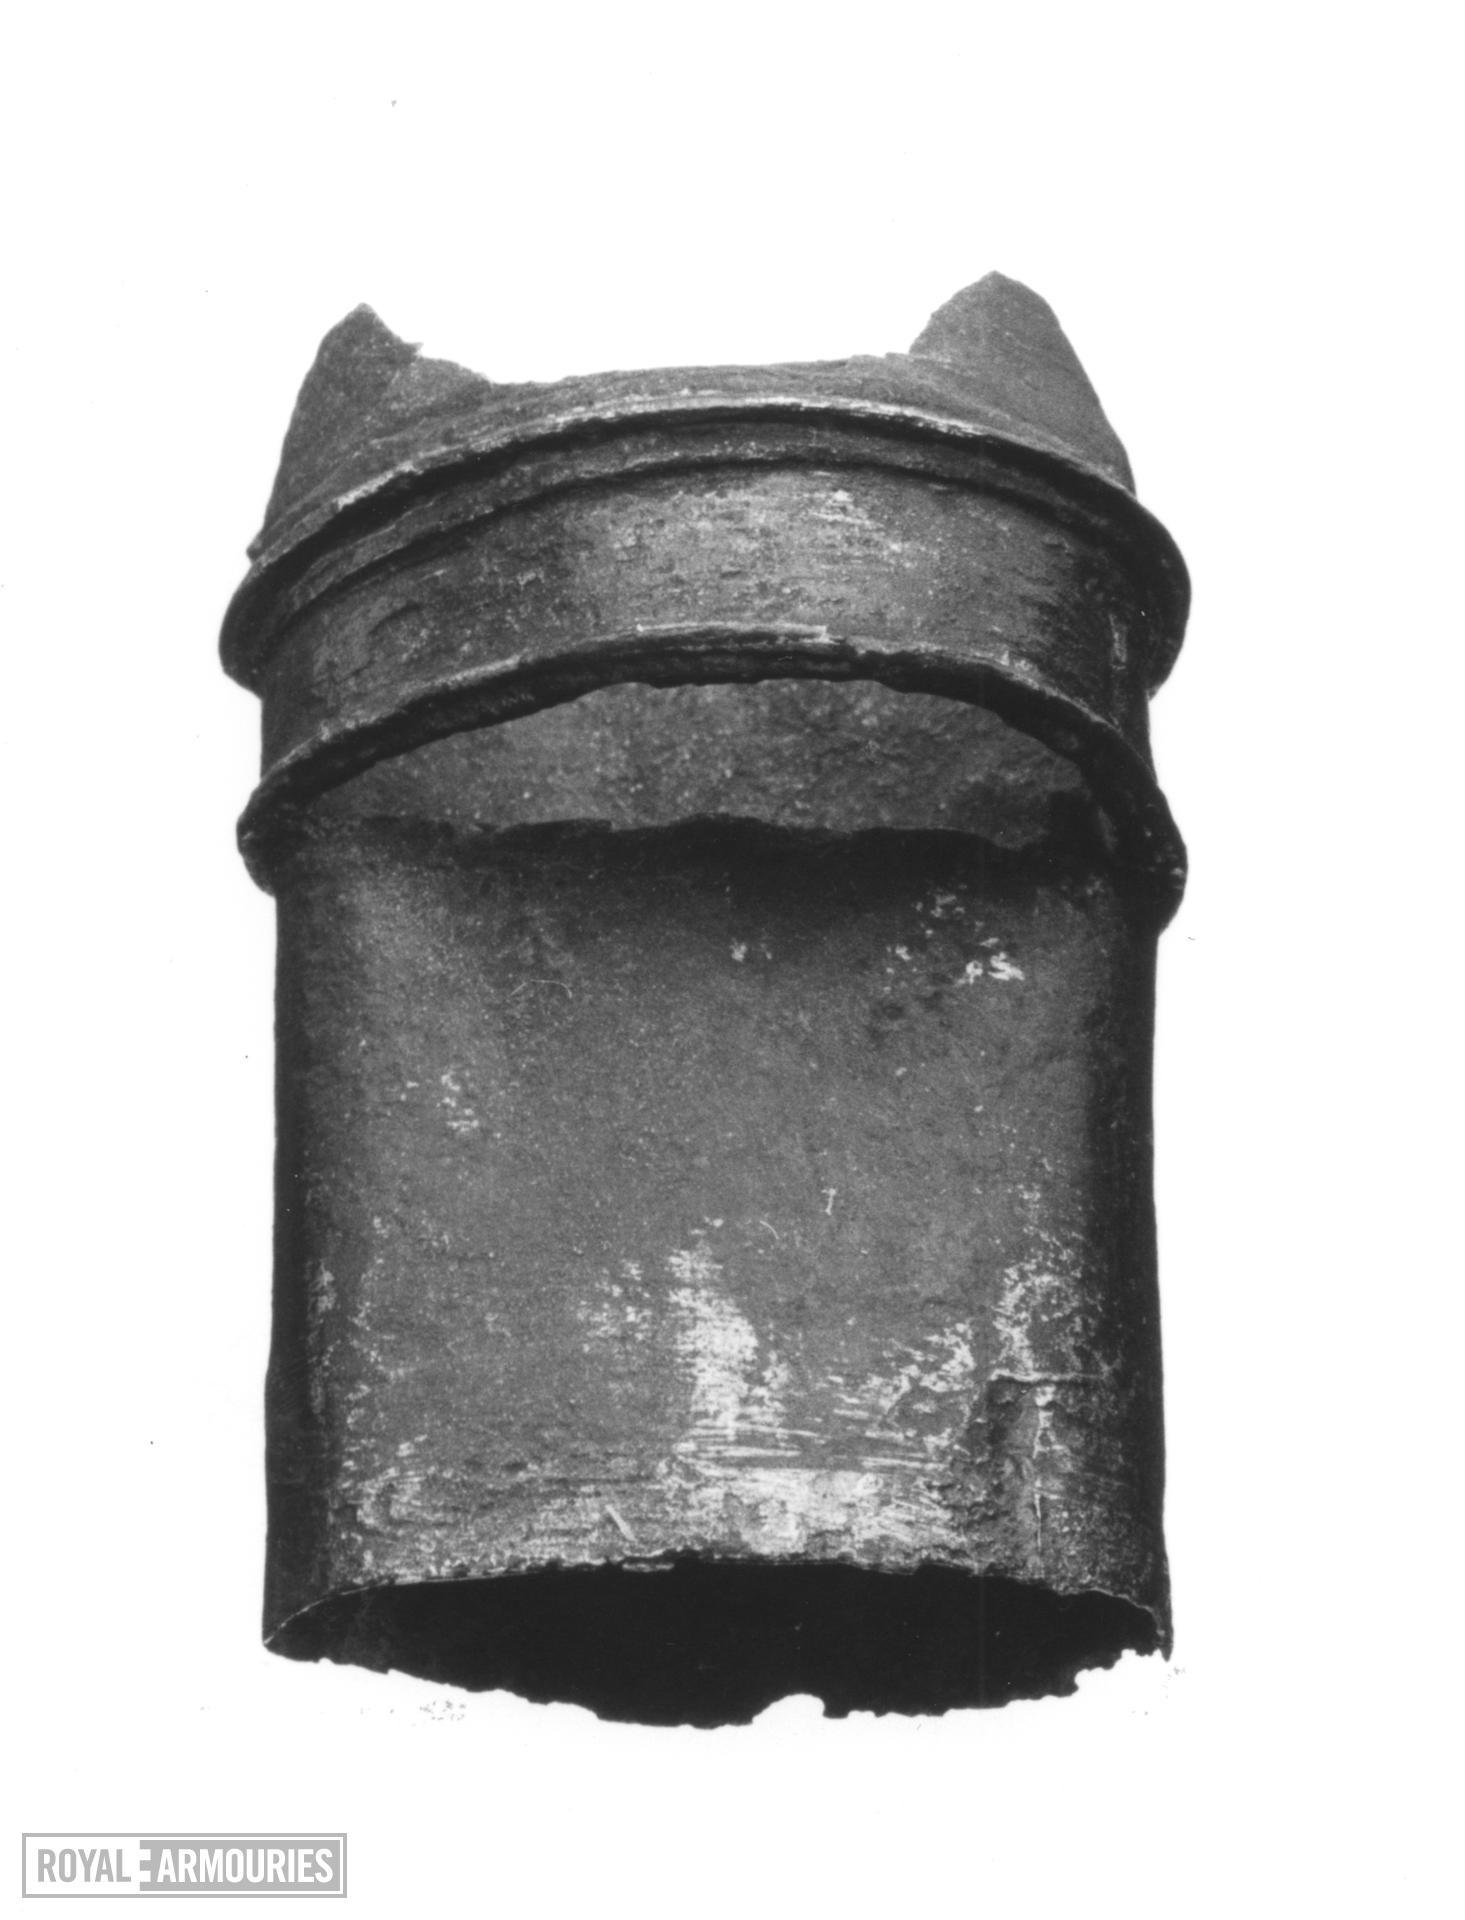 Top locket Top locket for dagger sheath